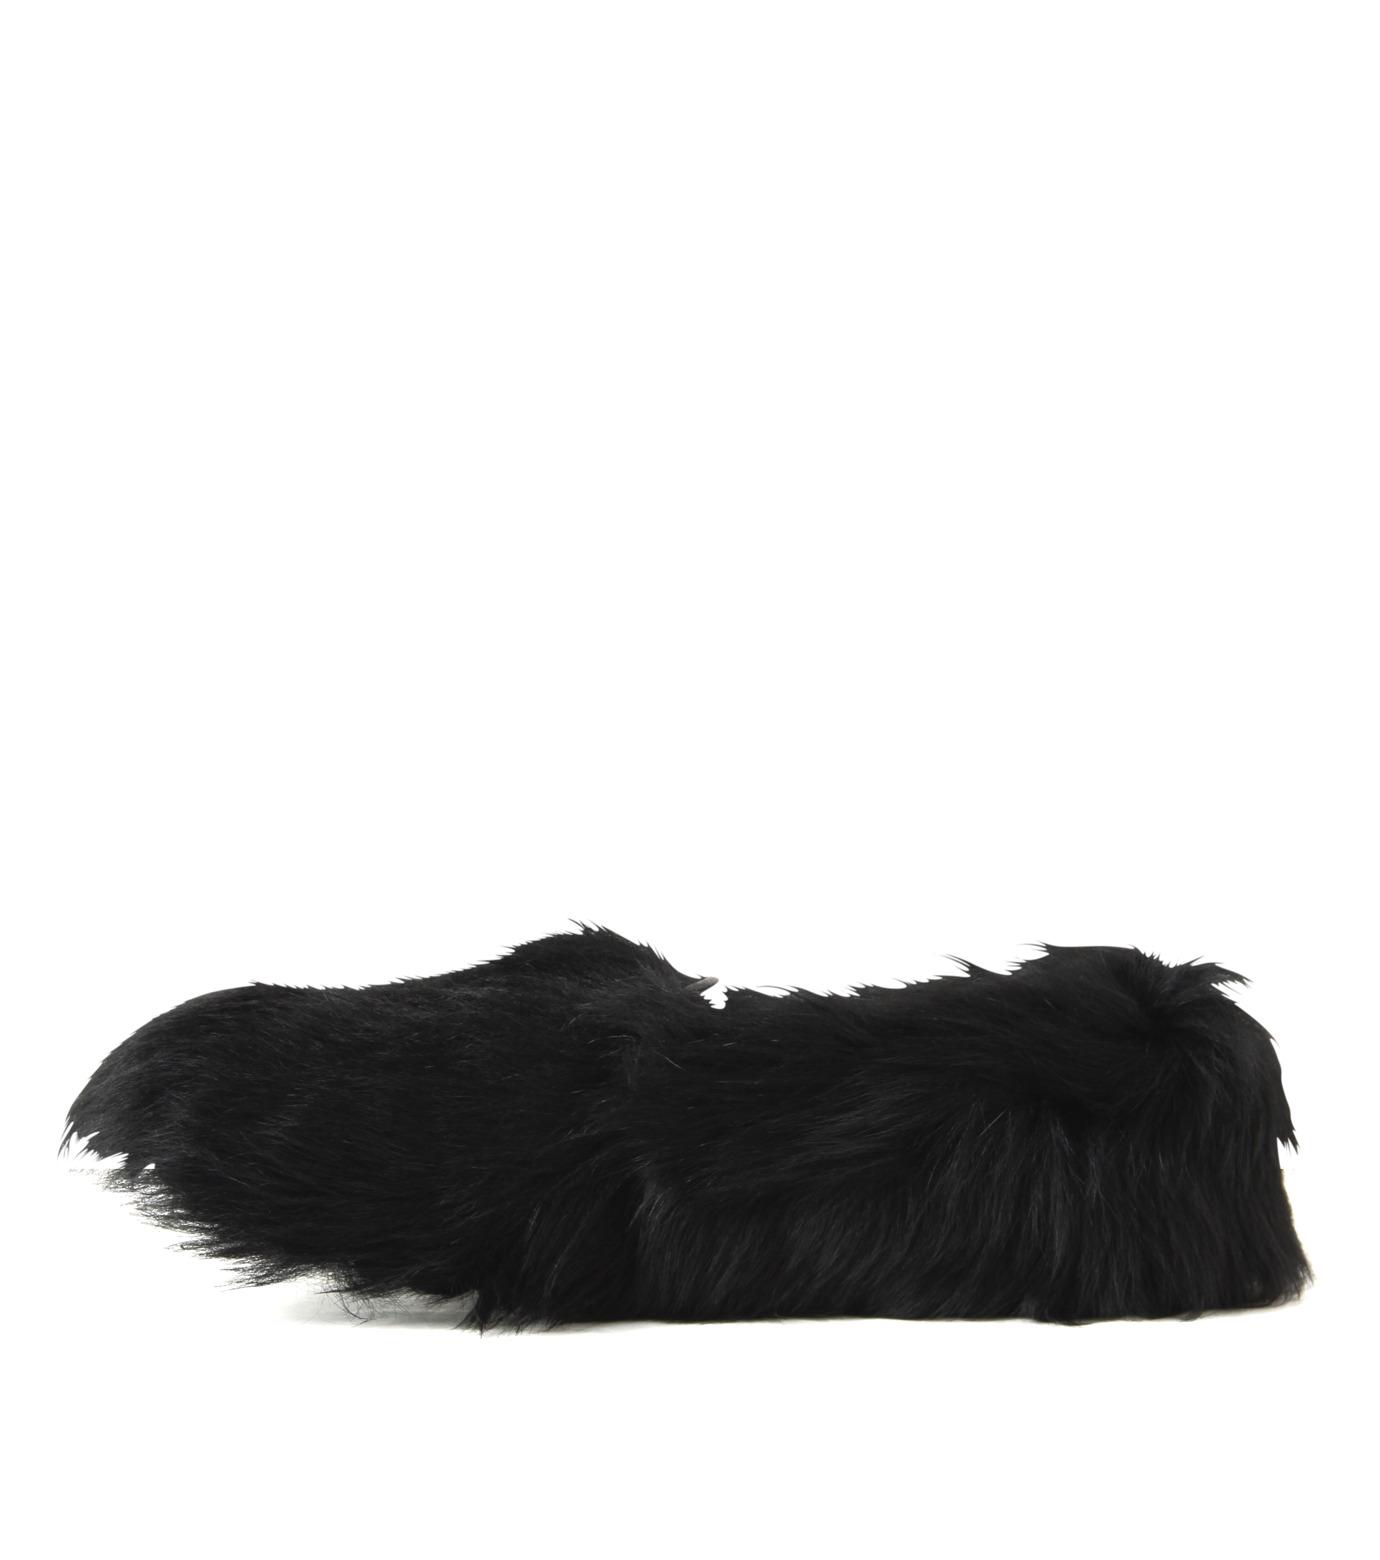 ACNE STUDIOS(アクネ ストゥディオズ)のBalto Fur Slipon-BLACK(シューズ/shoes)-2E0144-13 拡大詳細画像2